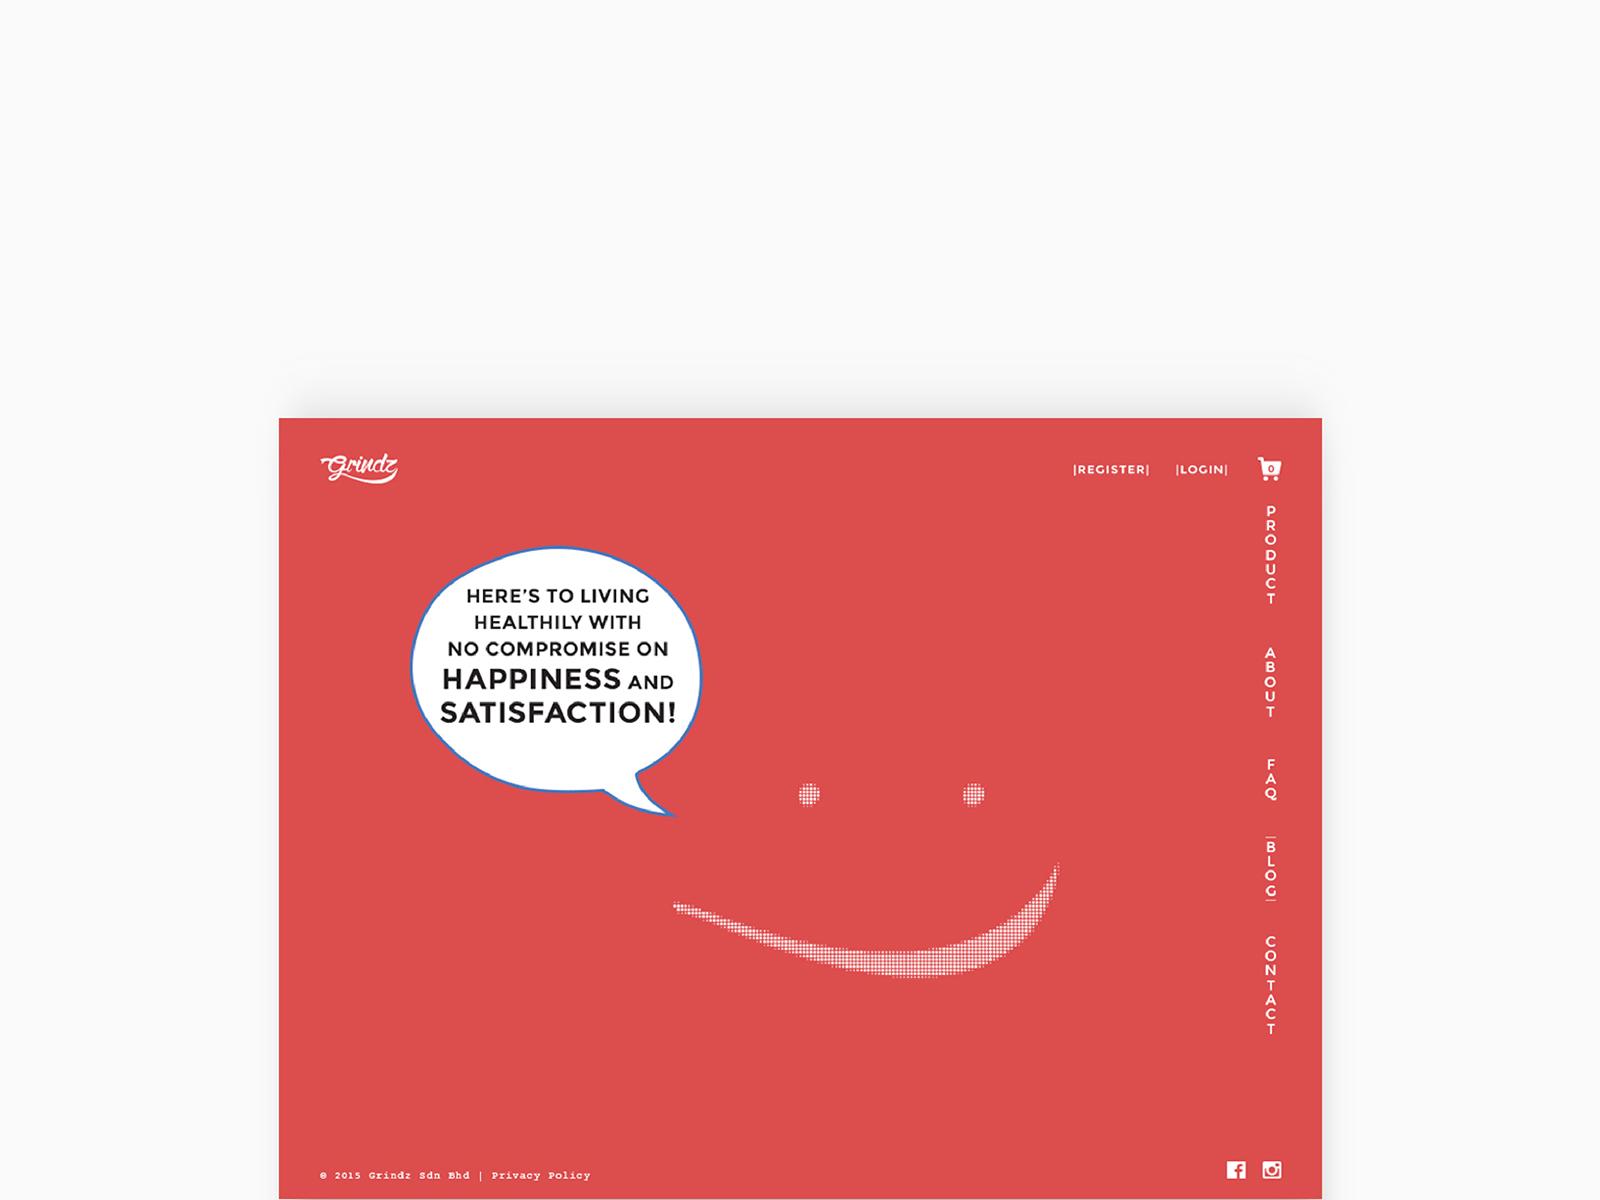 Grindz supplement brand website desktop view showing landing with animated graphics